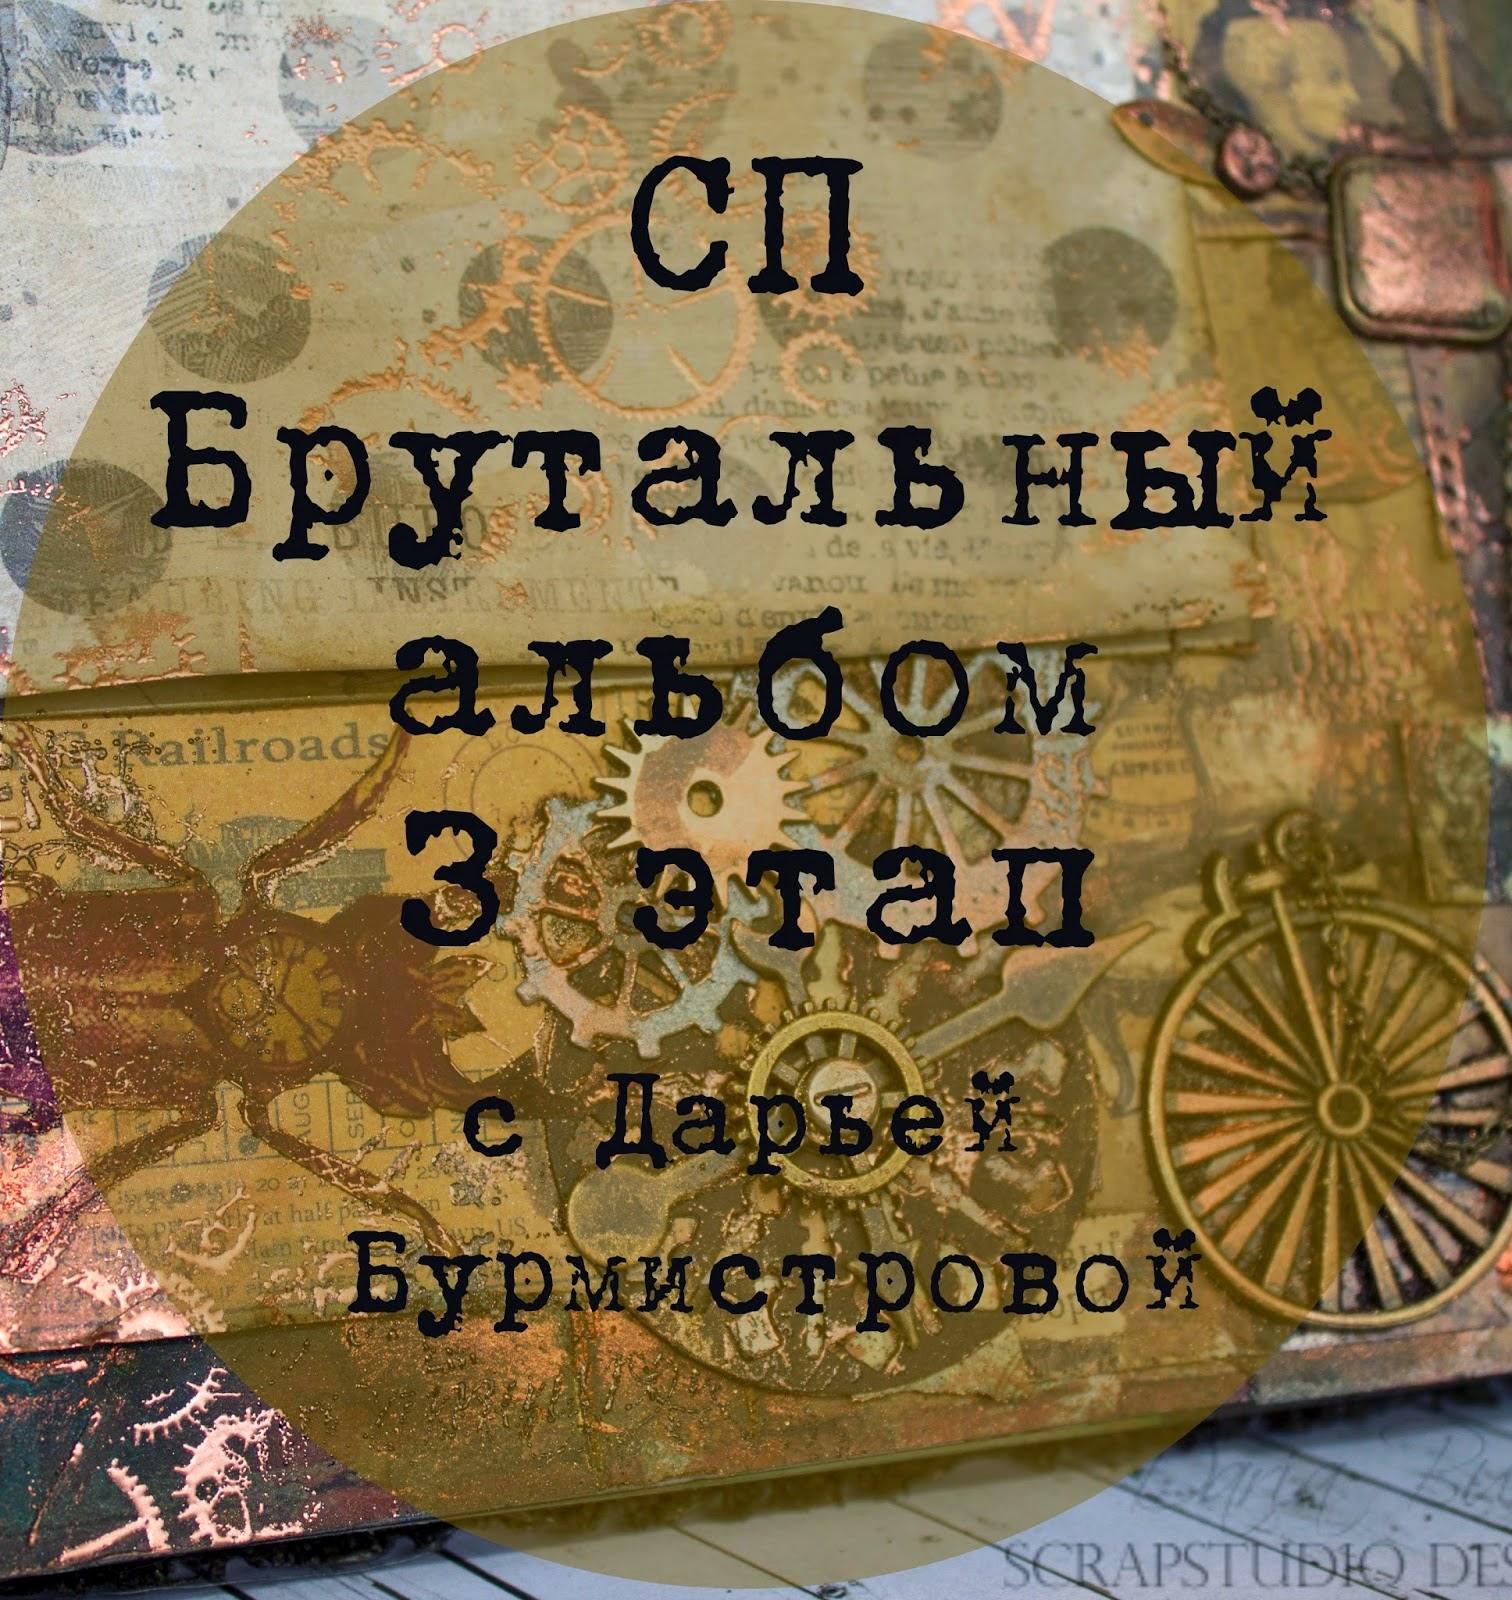 http://dburmistrova.blogspot.ru/2015/01/3.html?showComment=1422695265863#c7690636689831092649